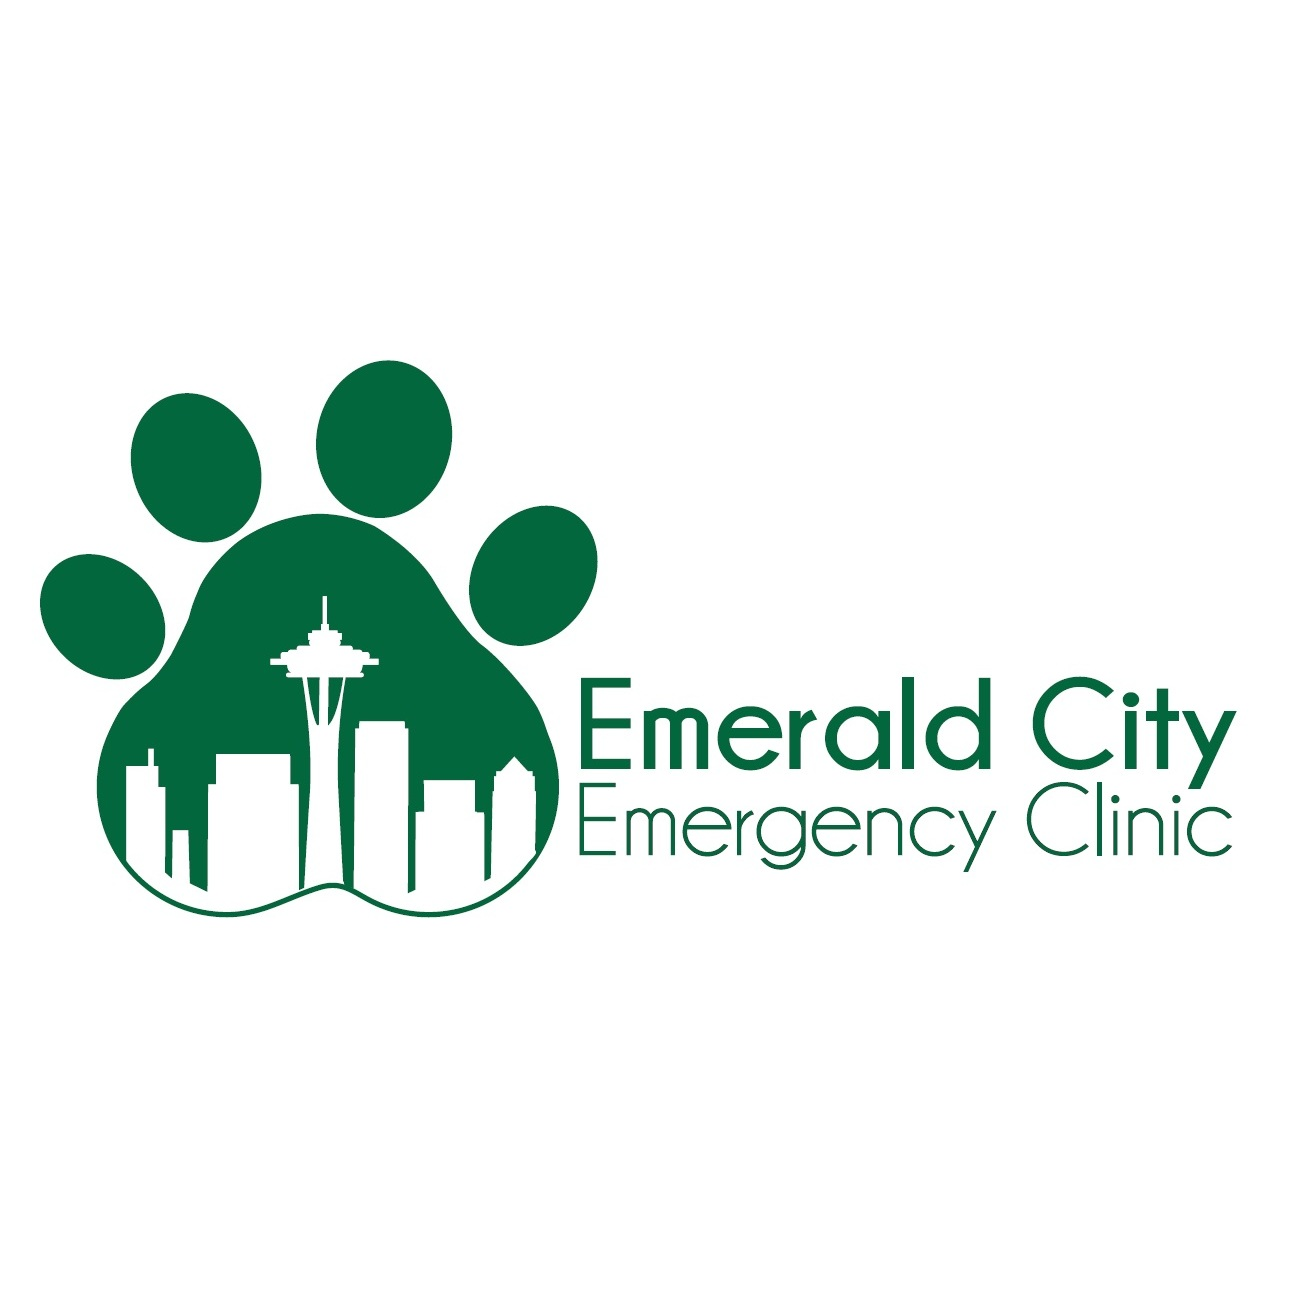 Emerald City Emergency Clinic